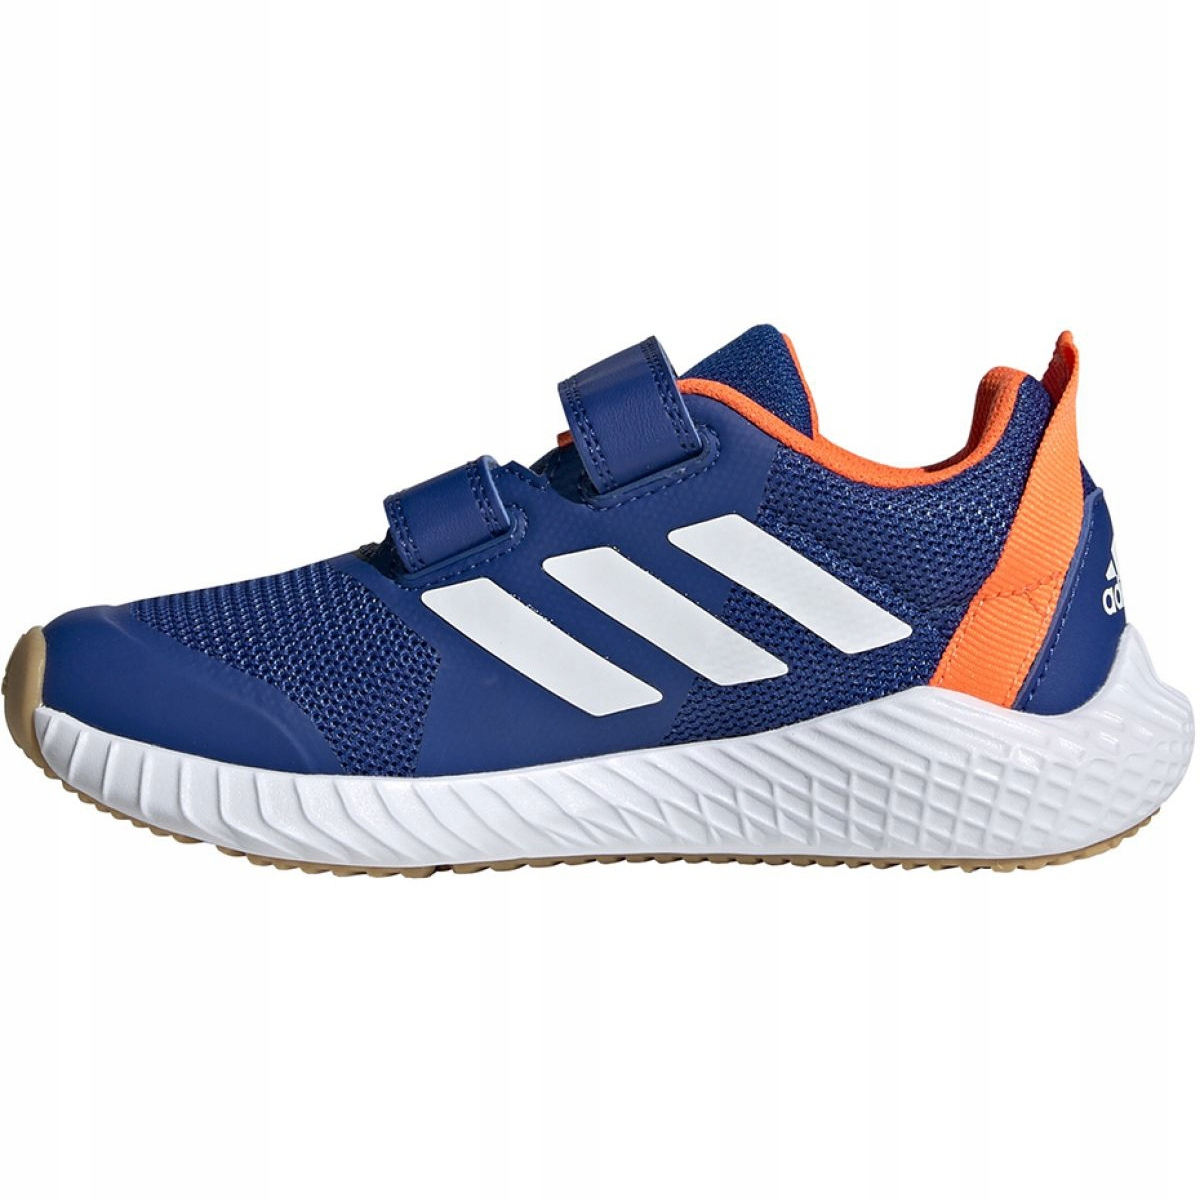 Adidas Havoc K AQ3327 Kids Fitness skor | Fruugo